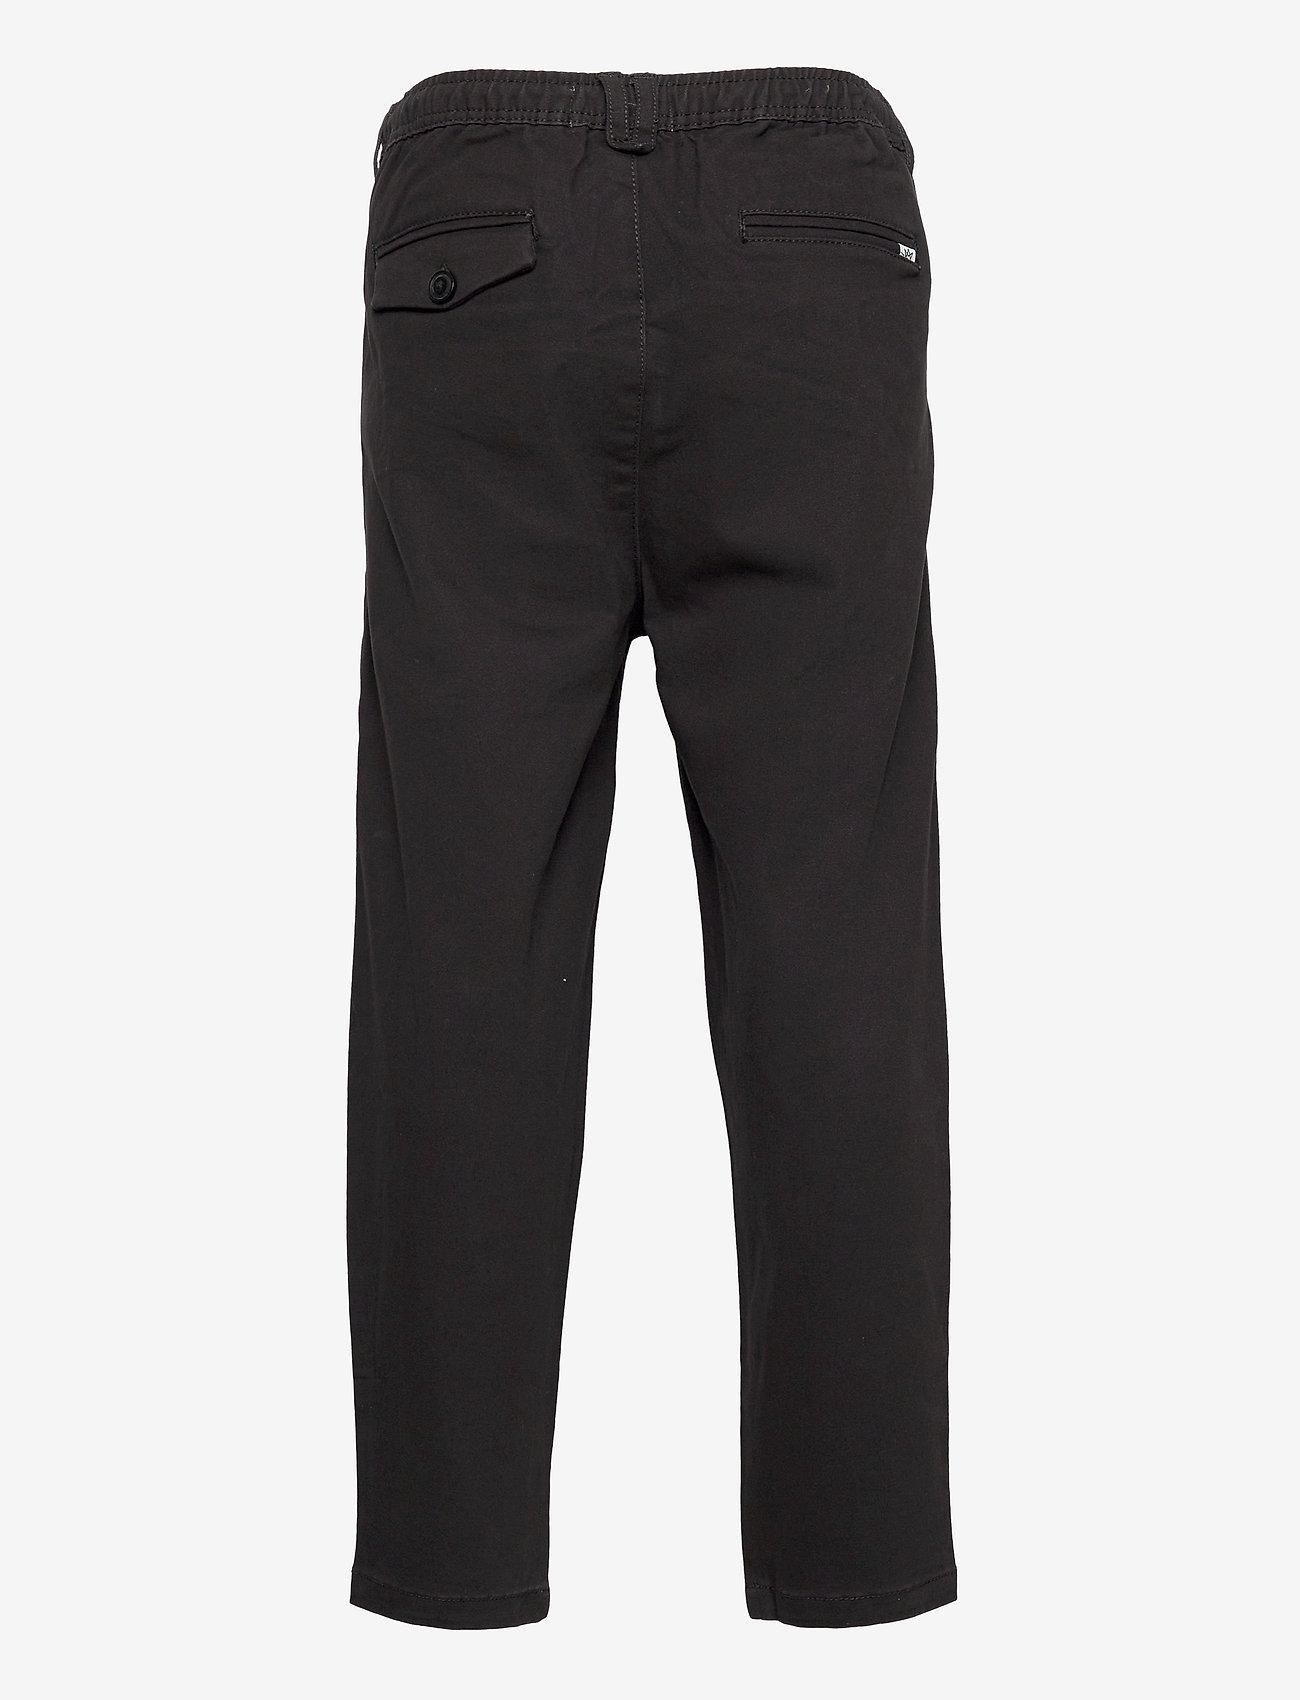 Kronstadt - Mason - trousers - black - 1